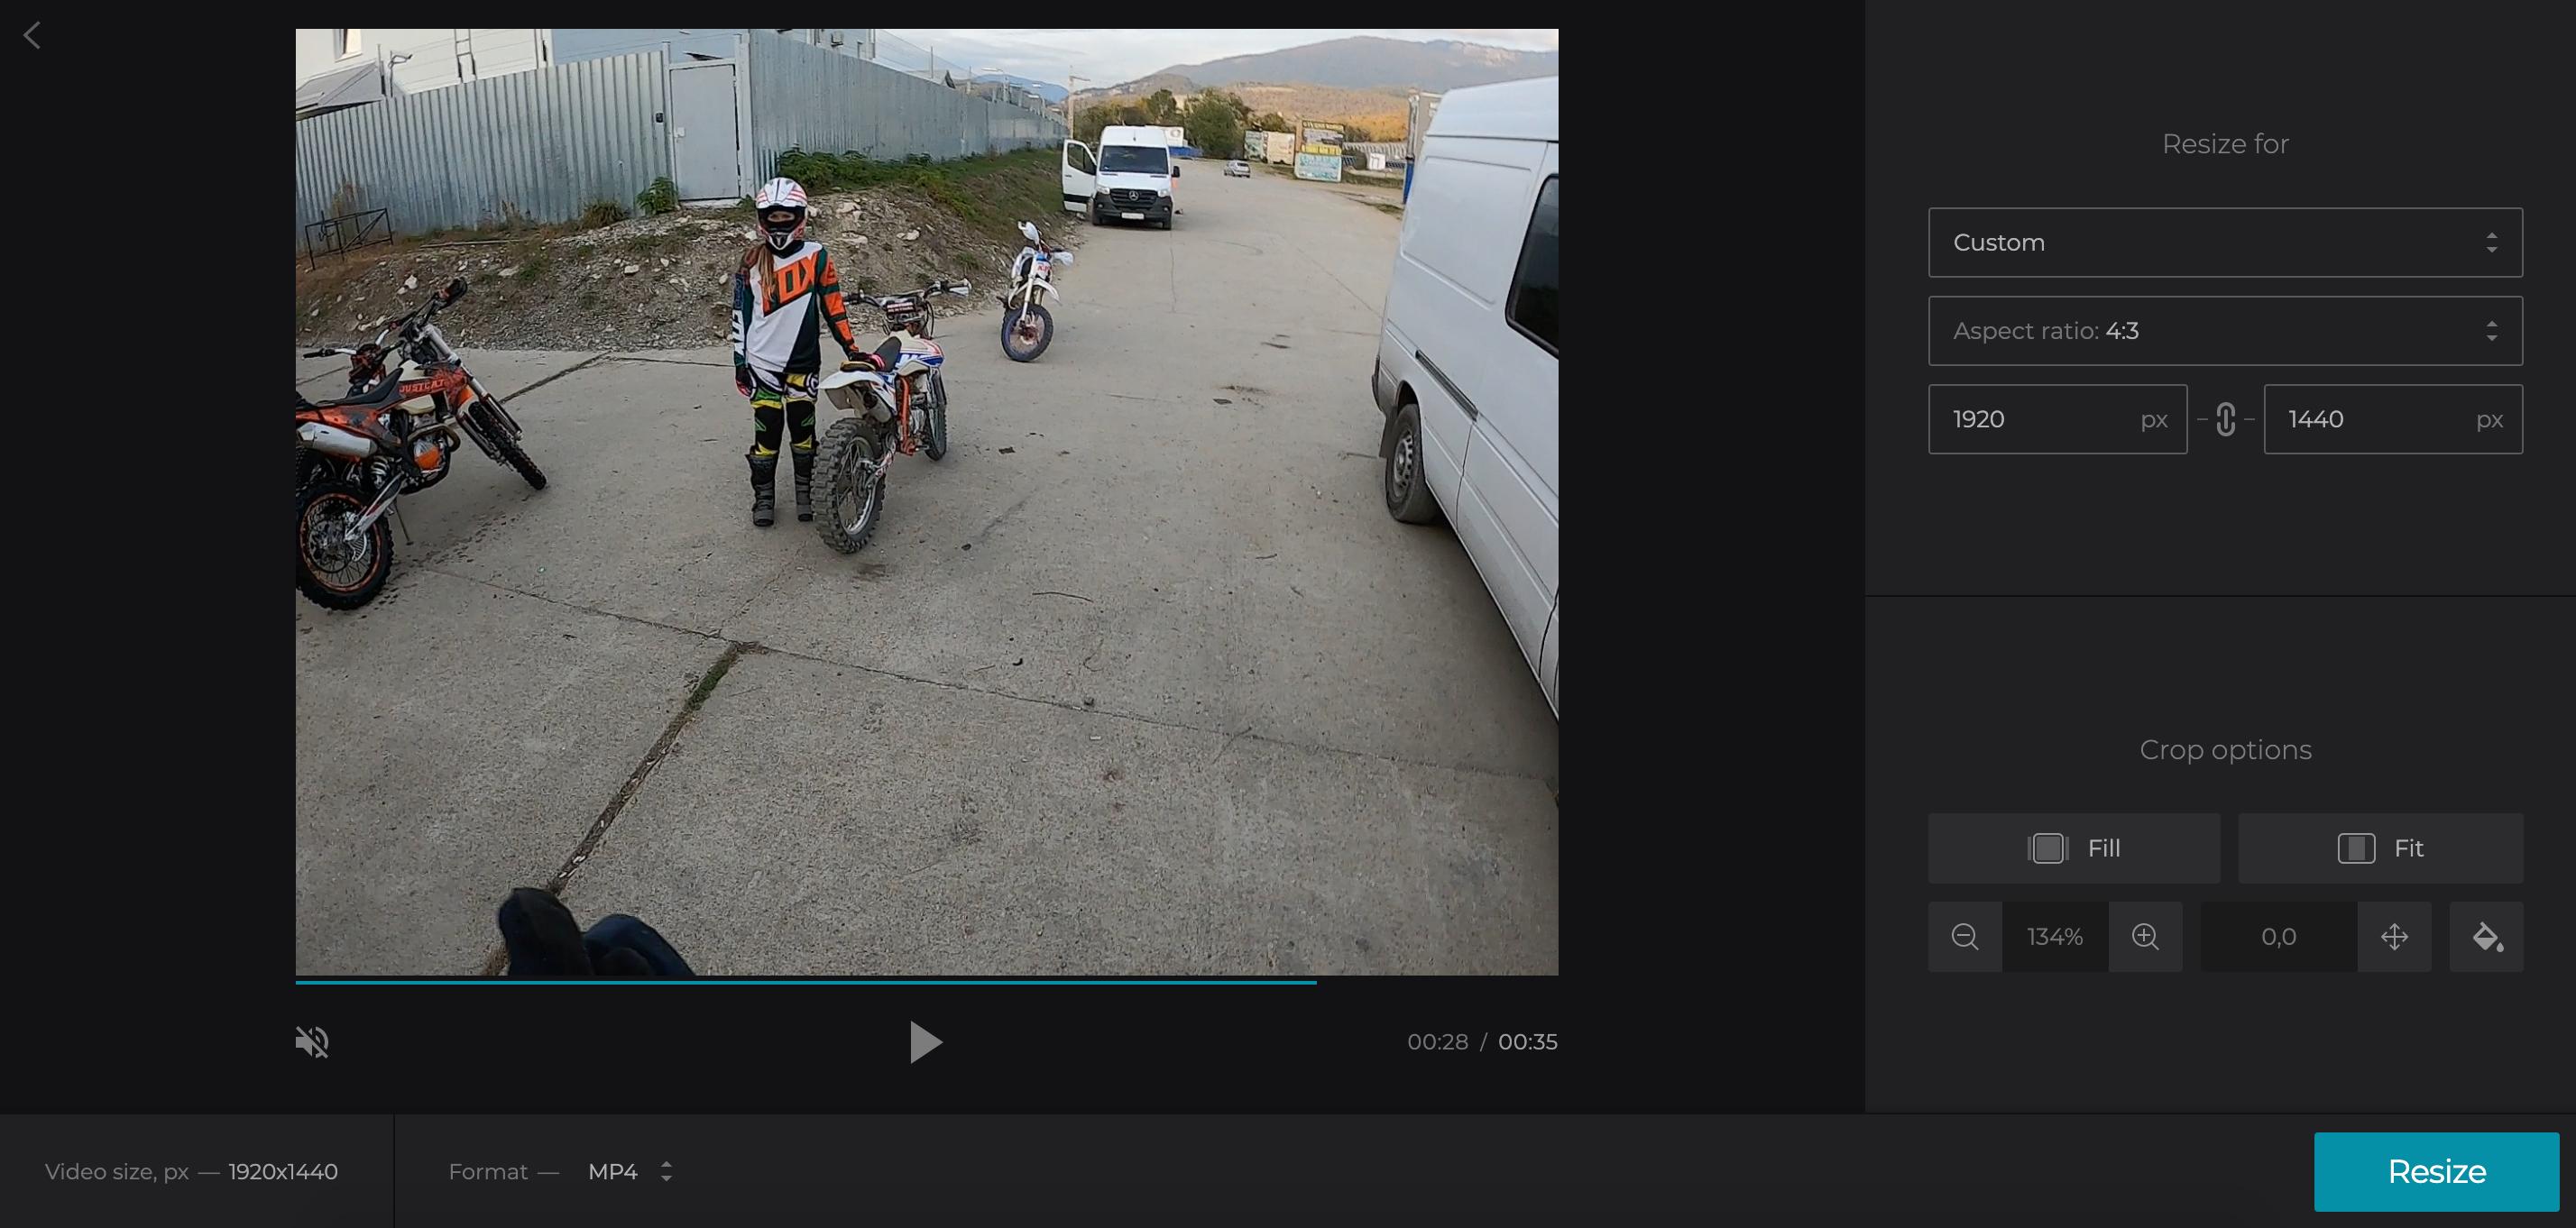 Crop video to delete black bars